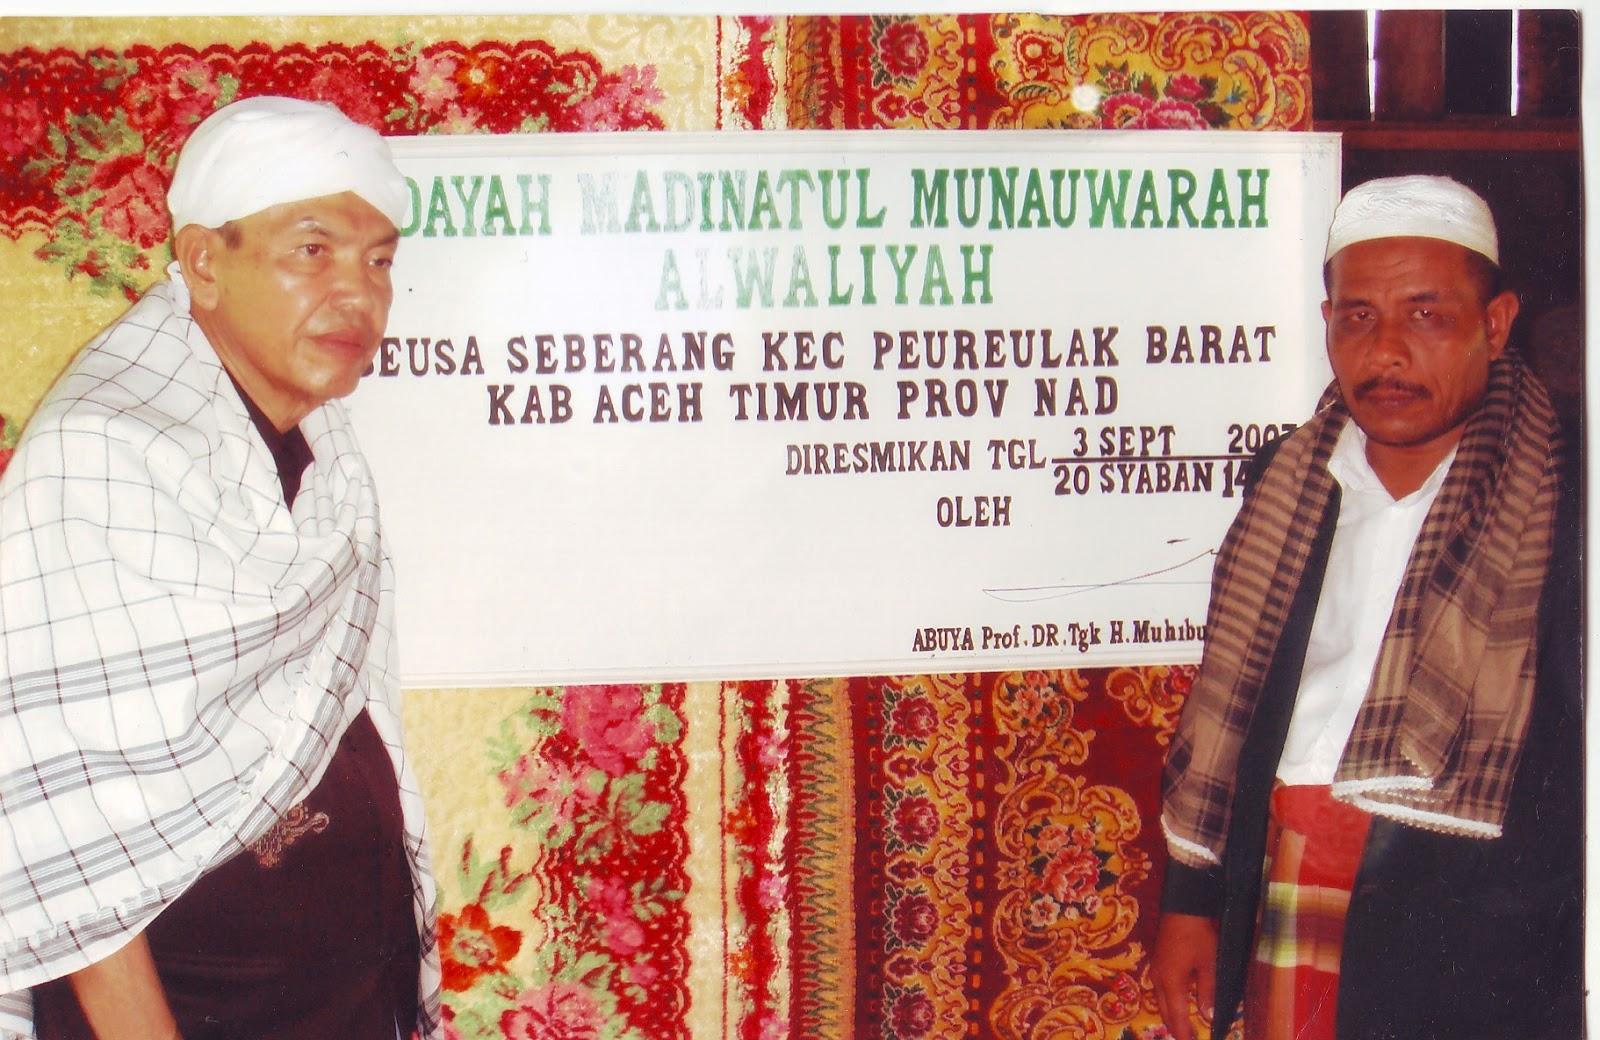 Abuya Prof.DR.tgk.H.Muhibuddin Waly meresmikan Dayah Amal